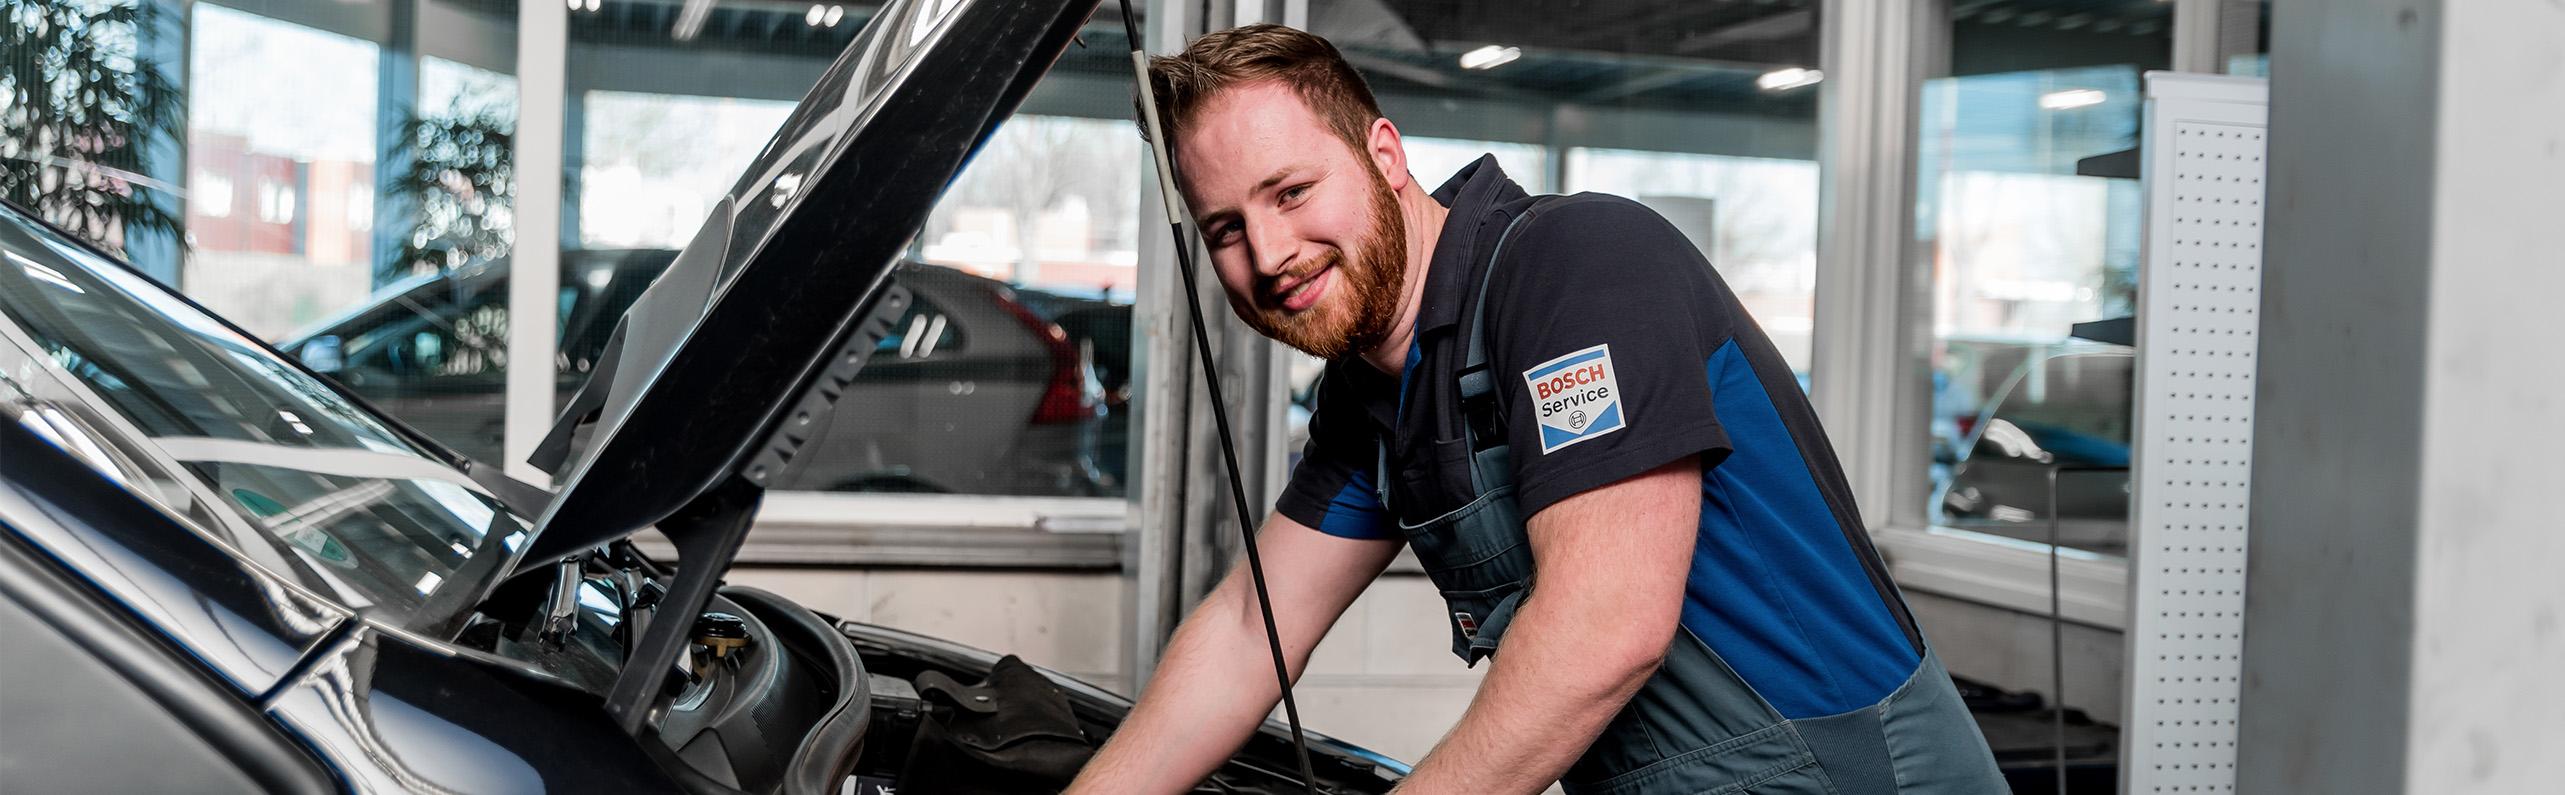 Onderhoud autobedrijf Kees Roks Roosendaal